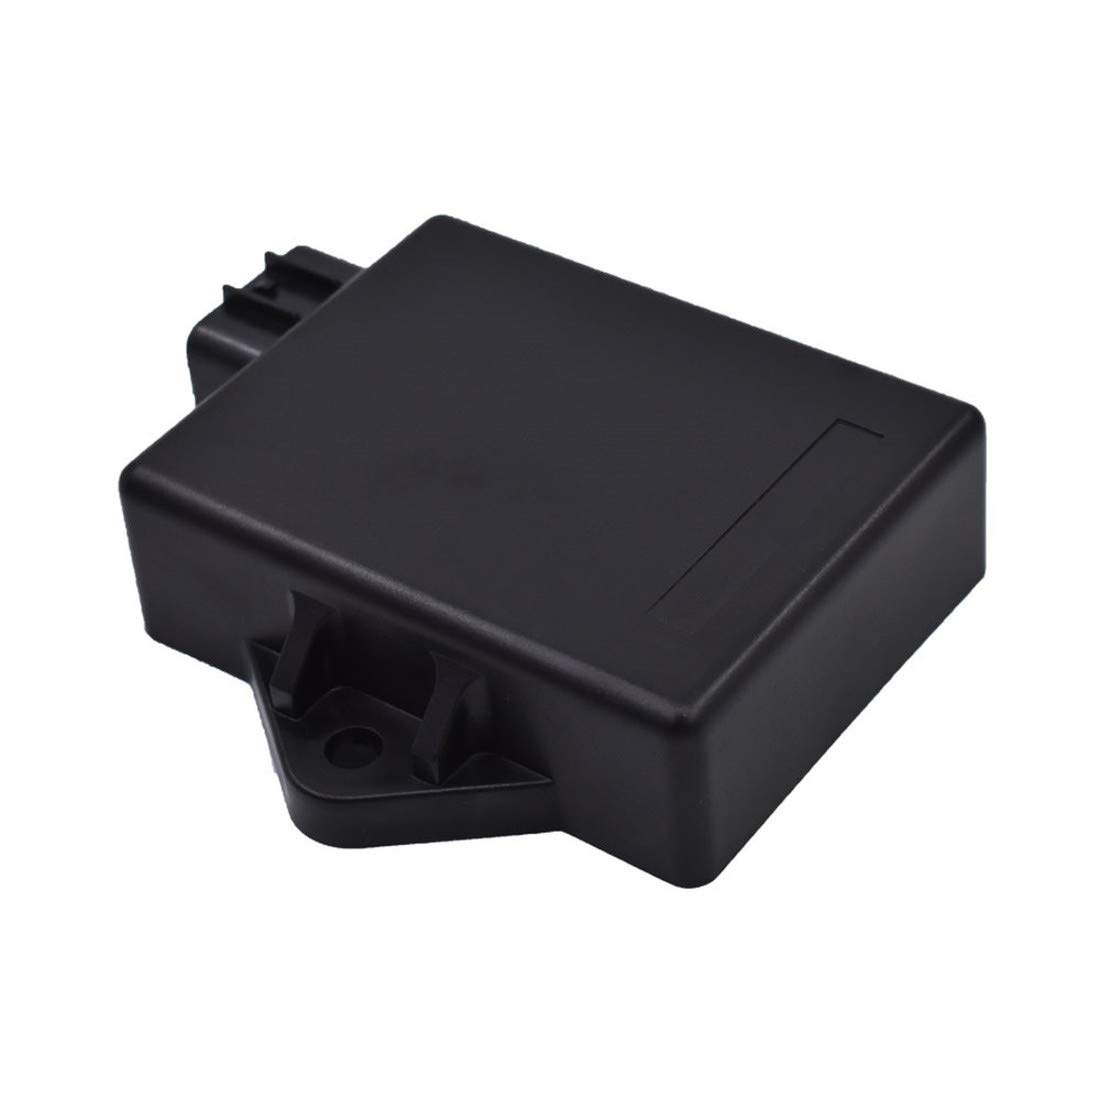 WFLNHB CDI Igniter Fit for Yamaha Bear Tracker 250 YFM250X YFM250XH 2001-2004